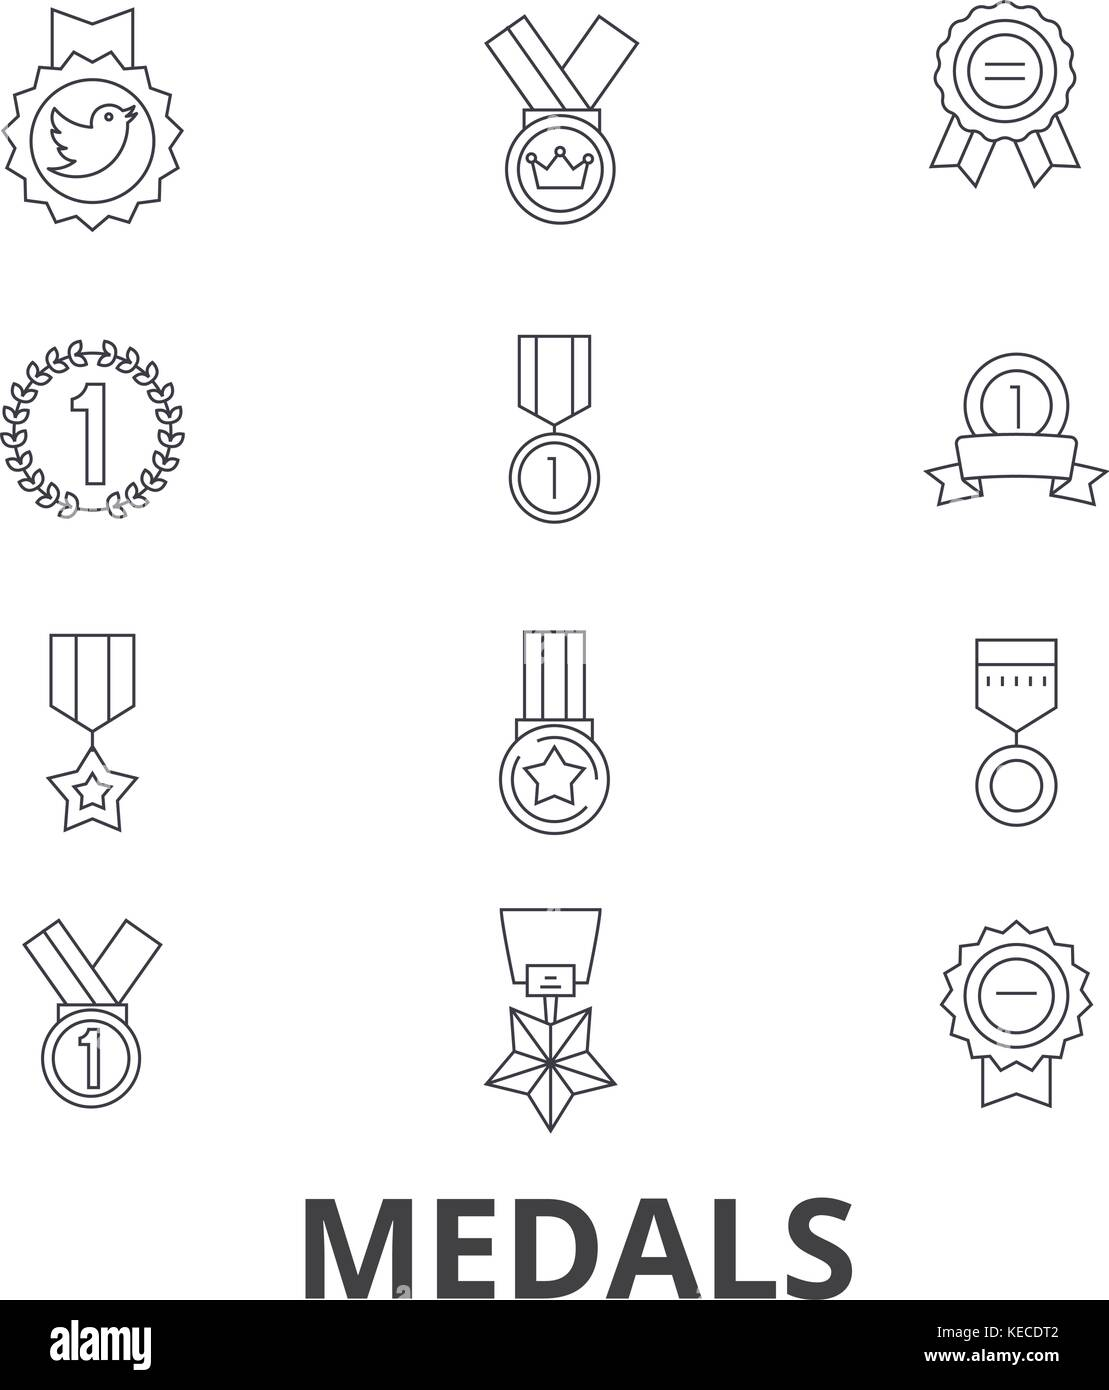 Medals, trophy, gold medal, award, medallion, olympic medal, winner, badge line icons. Editable strokes. Flat design - Stock Vector